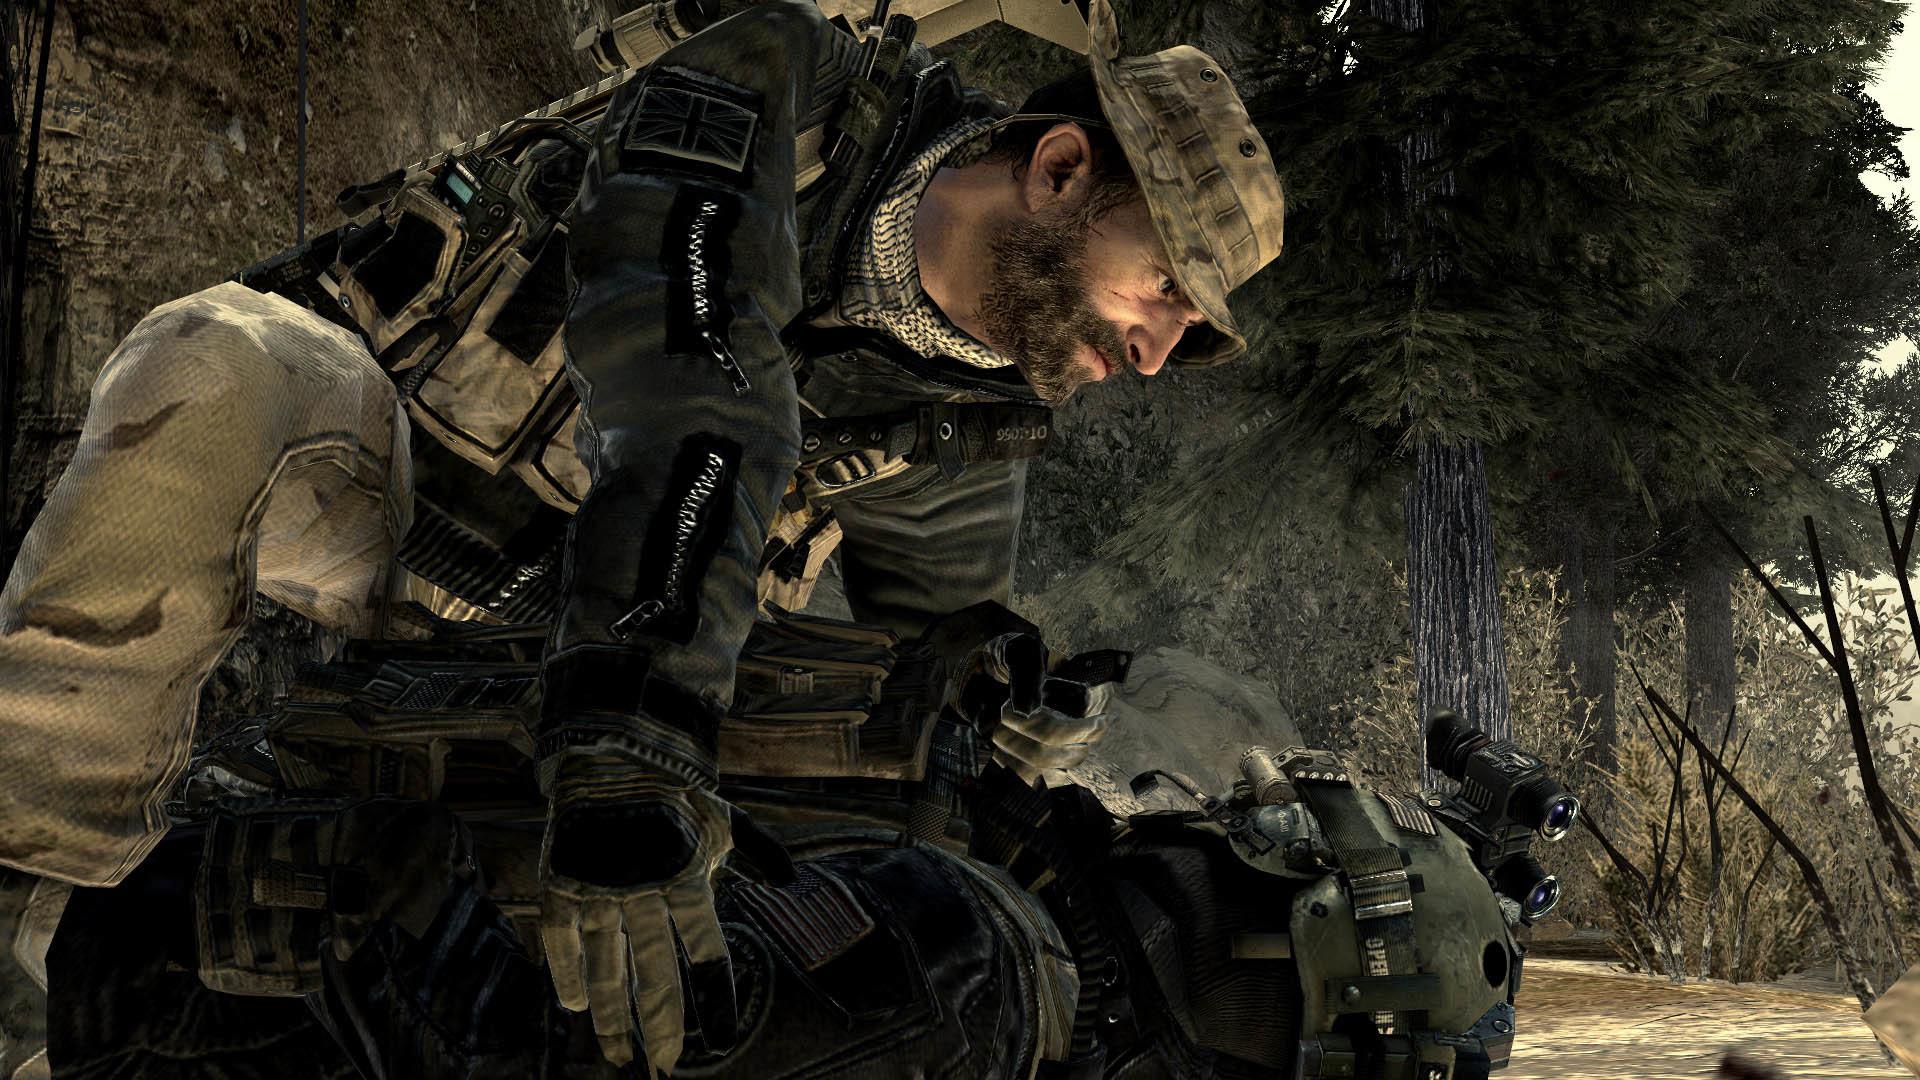 Ghost Recon Future Soldier Hd Wallpaper Modern Warfare 2 Wallpaper 1080p 75 Images